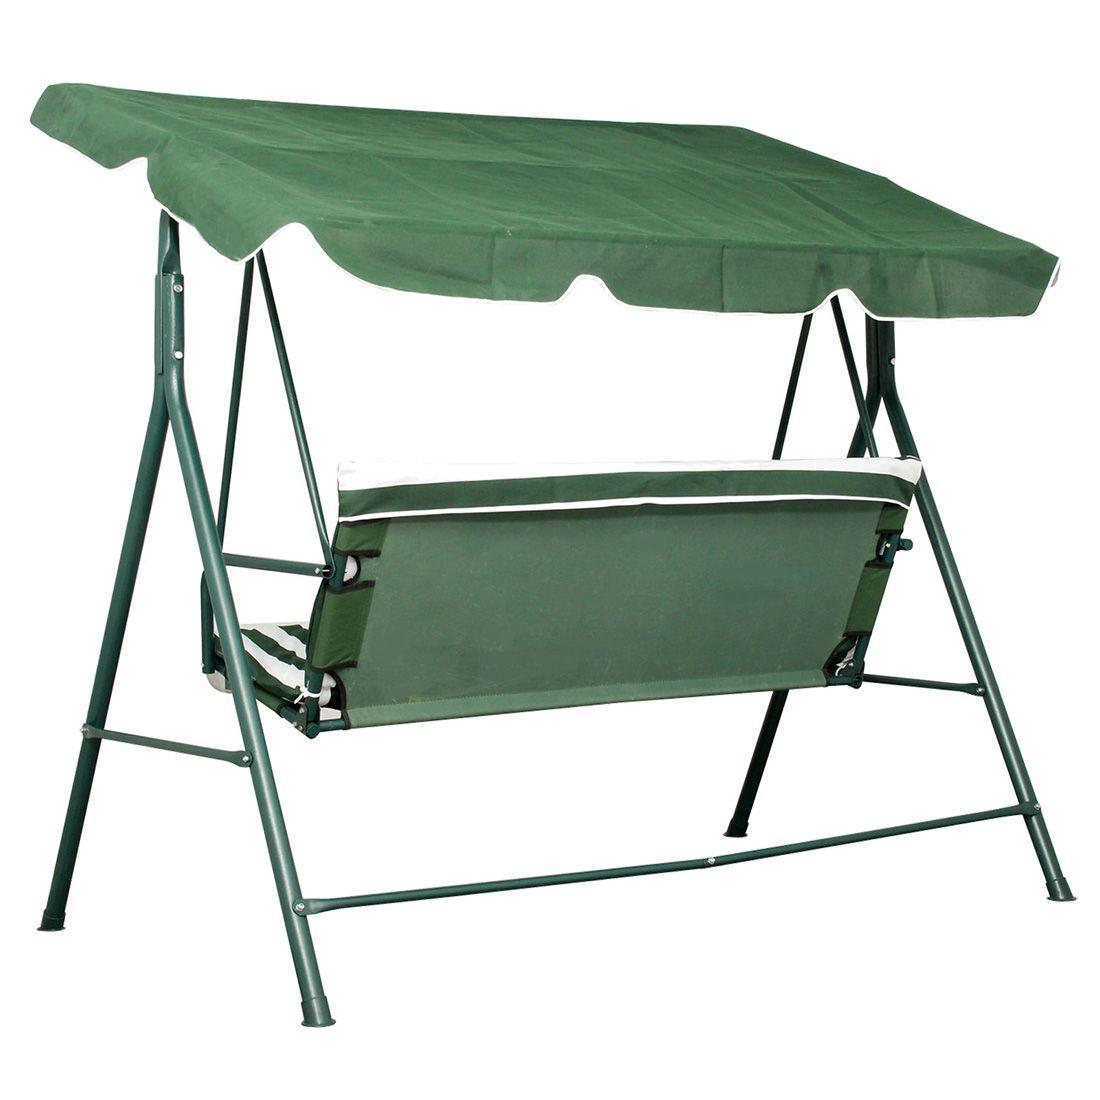 Fabulous Hot Sale Garden Patio Metal Swing Chair Seat 3 Seater Creativecarmelina Interior Chair Design Creativecarmelinacom